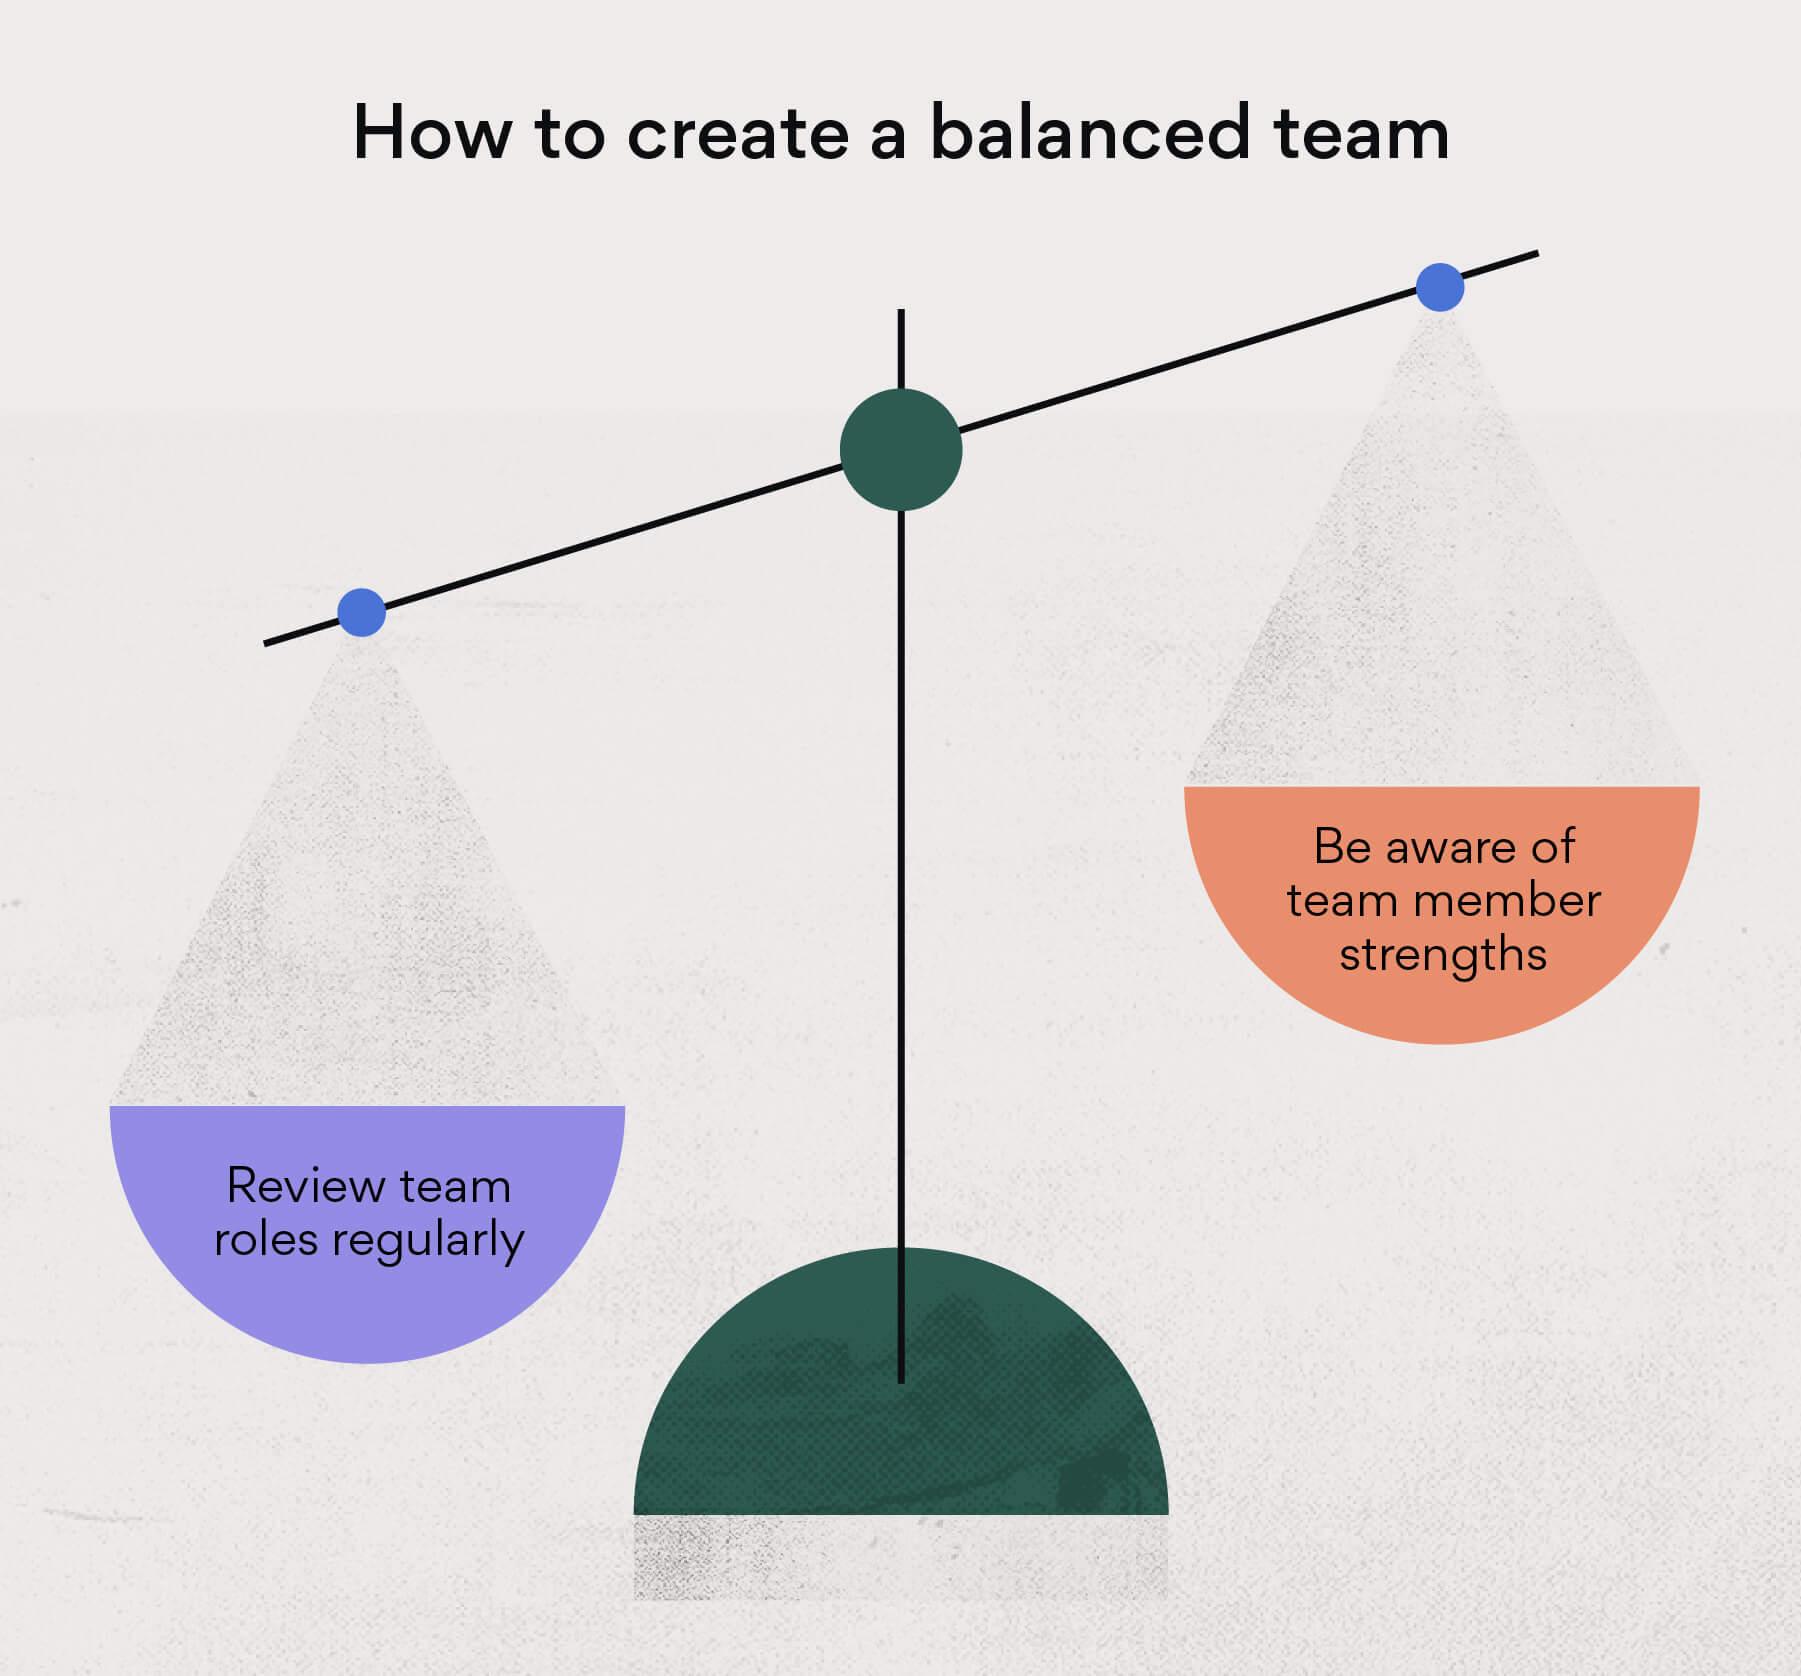 How to create a balanced team